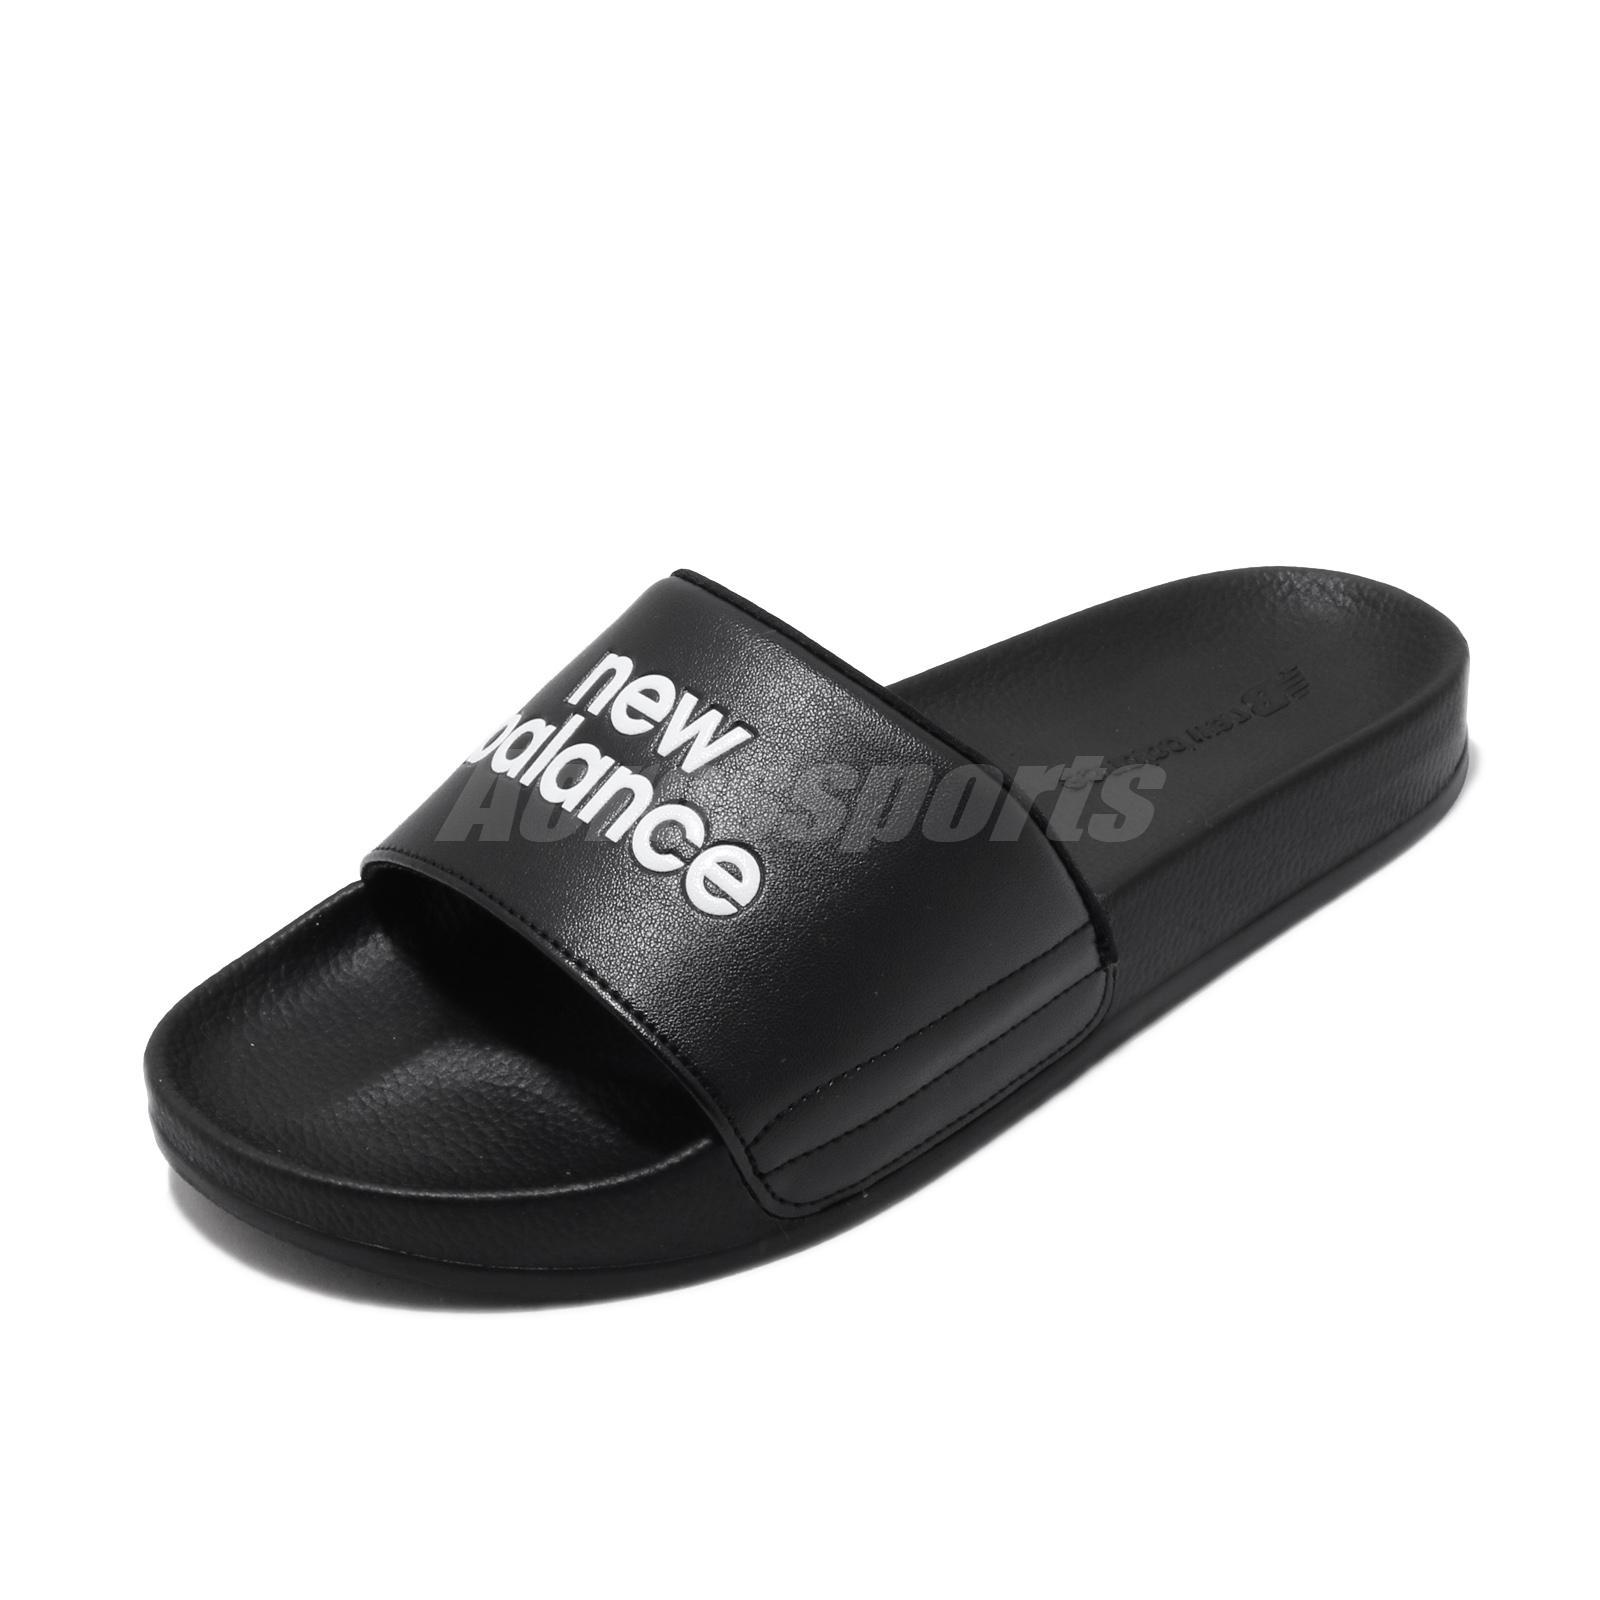 Champion pantoufles-Slide 70 Special-Black Dark Navy